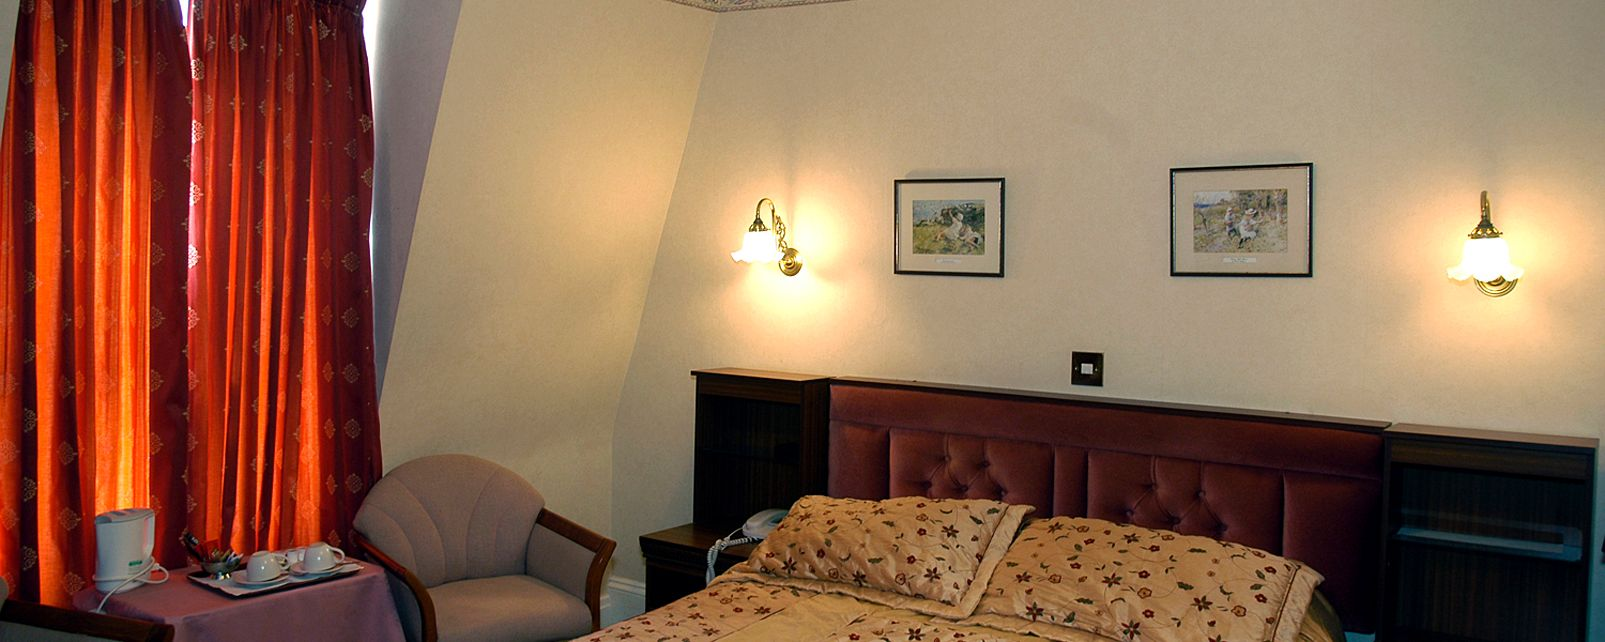 Hotel Monaco - Jersey